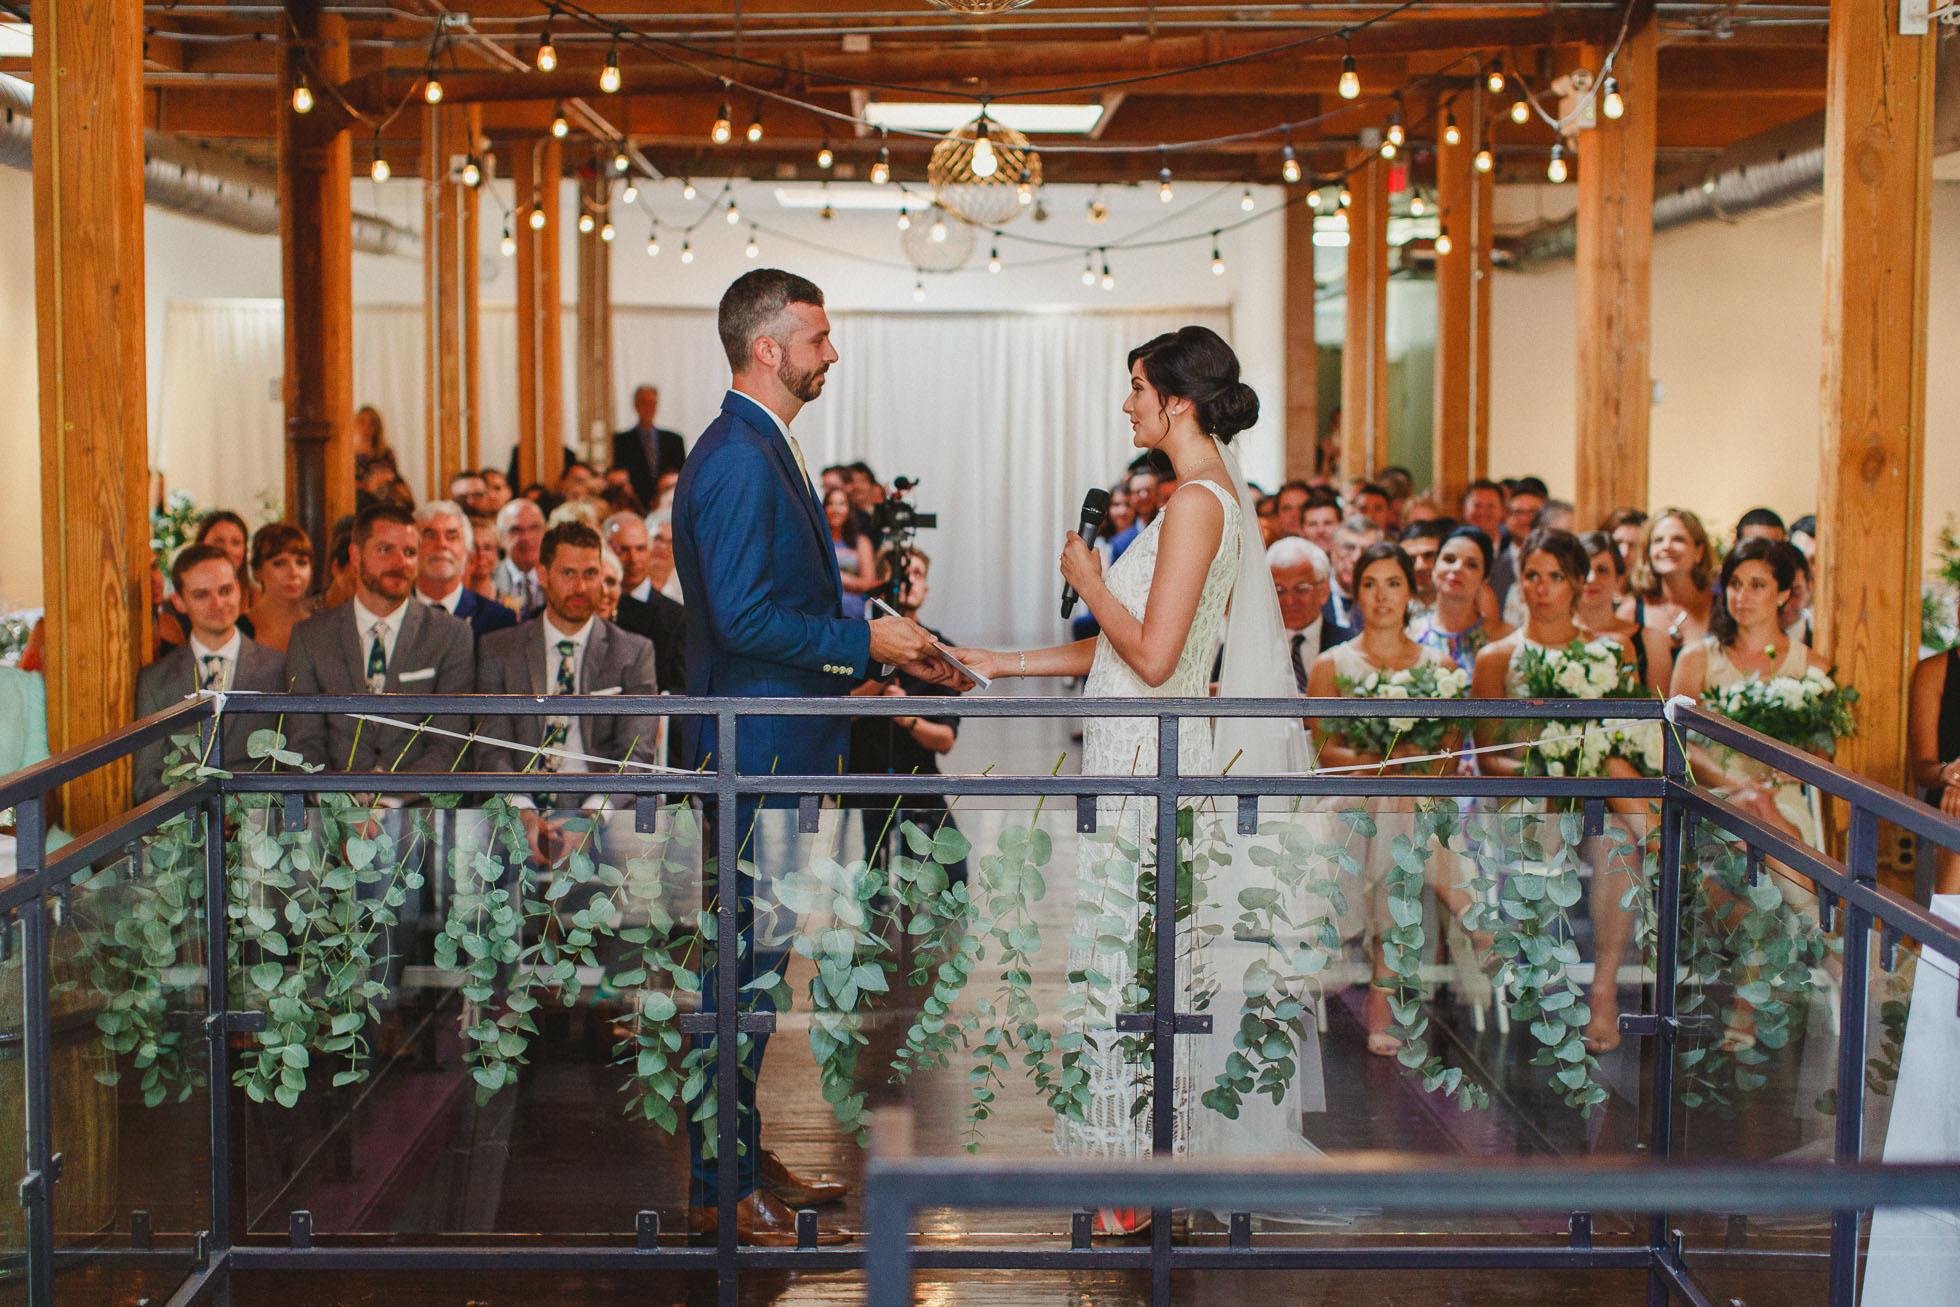 caroline-and-graeme-wedding-for-website-1960px-81-1.jpg